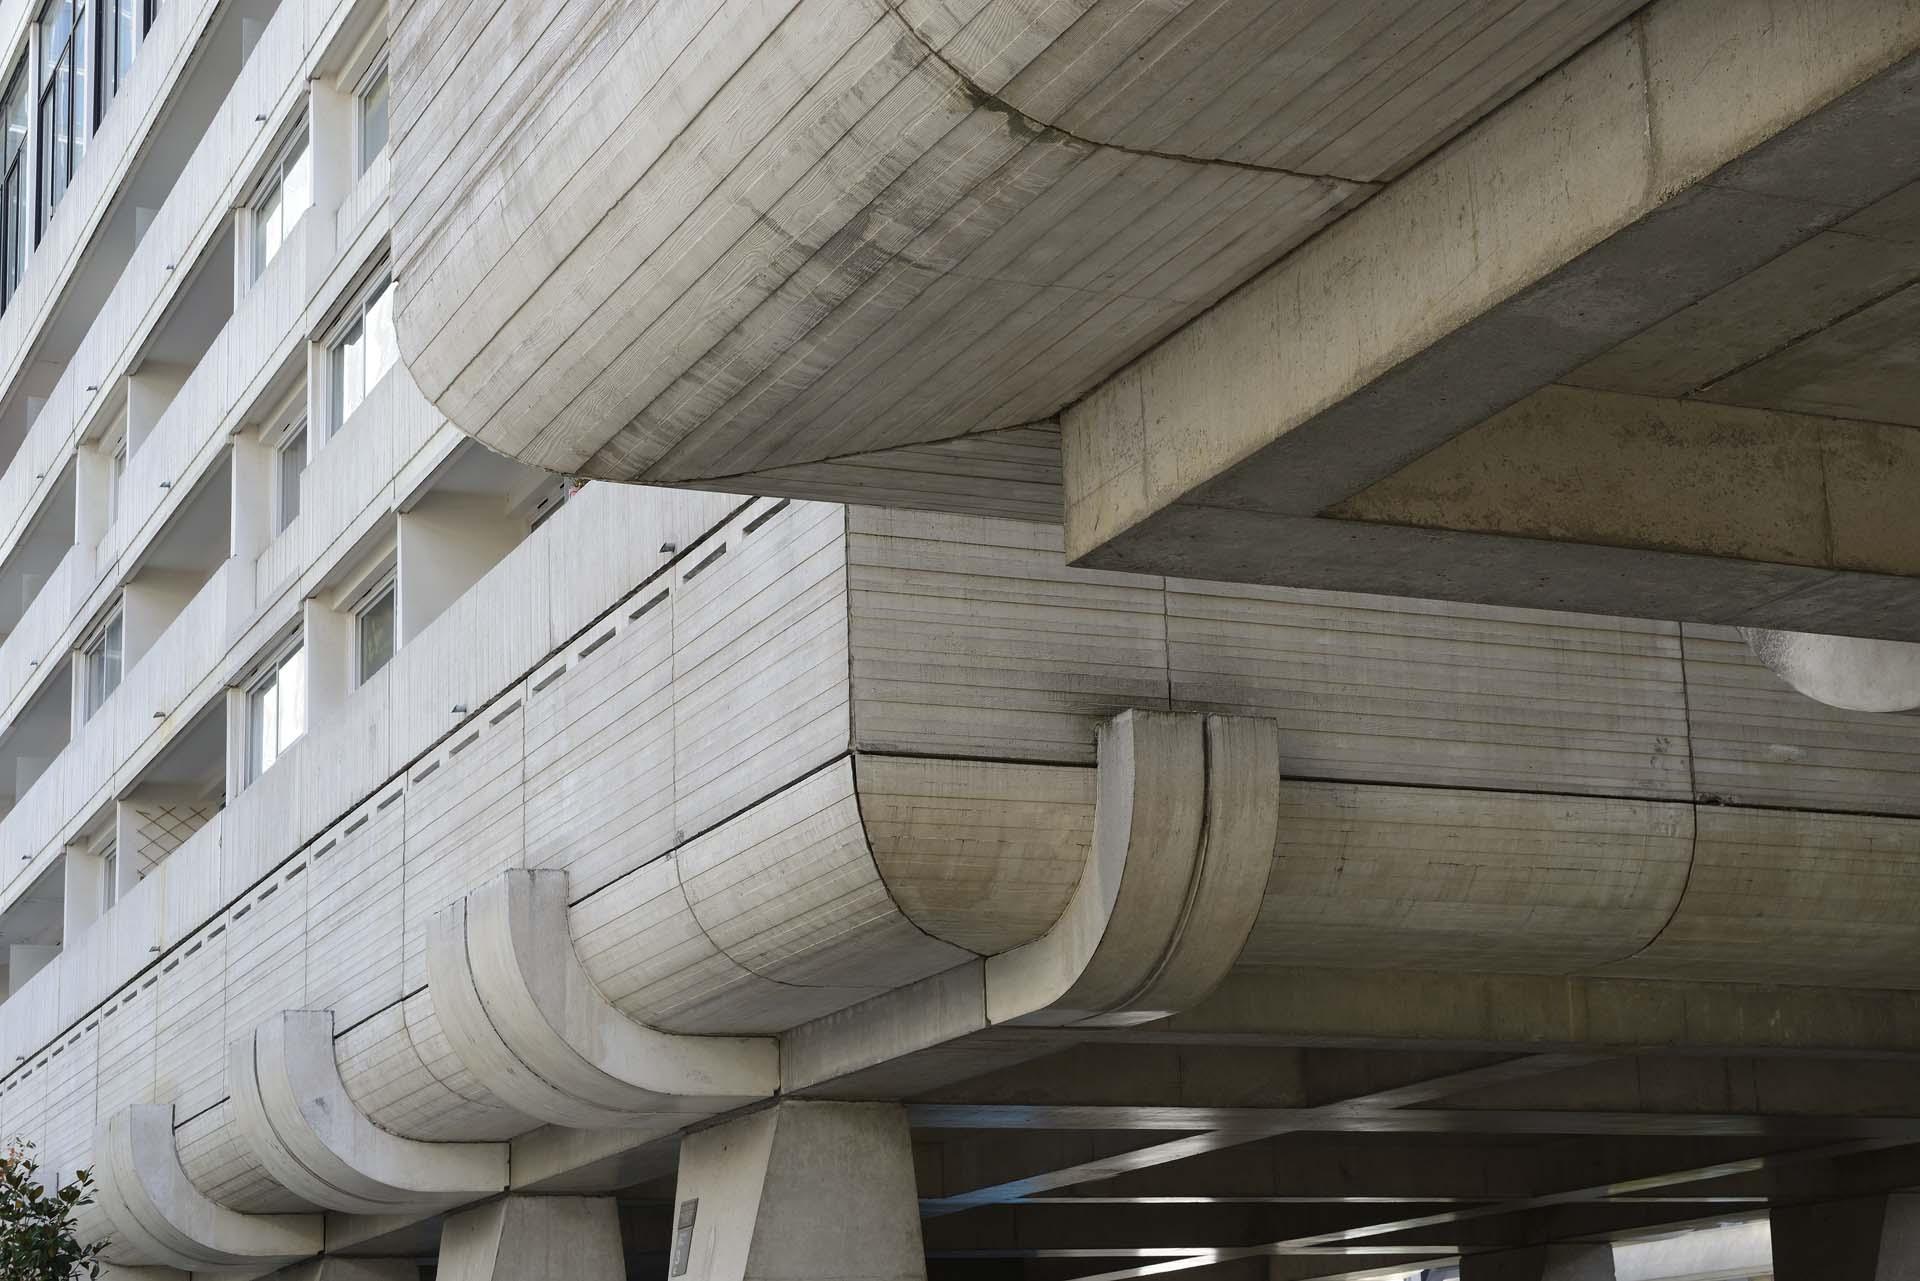 Vision 80 Apartment Blocks - Jouve, Frieschlander, Manfredos, 1970-73